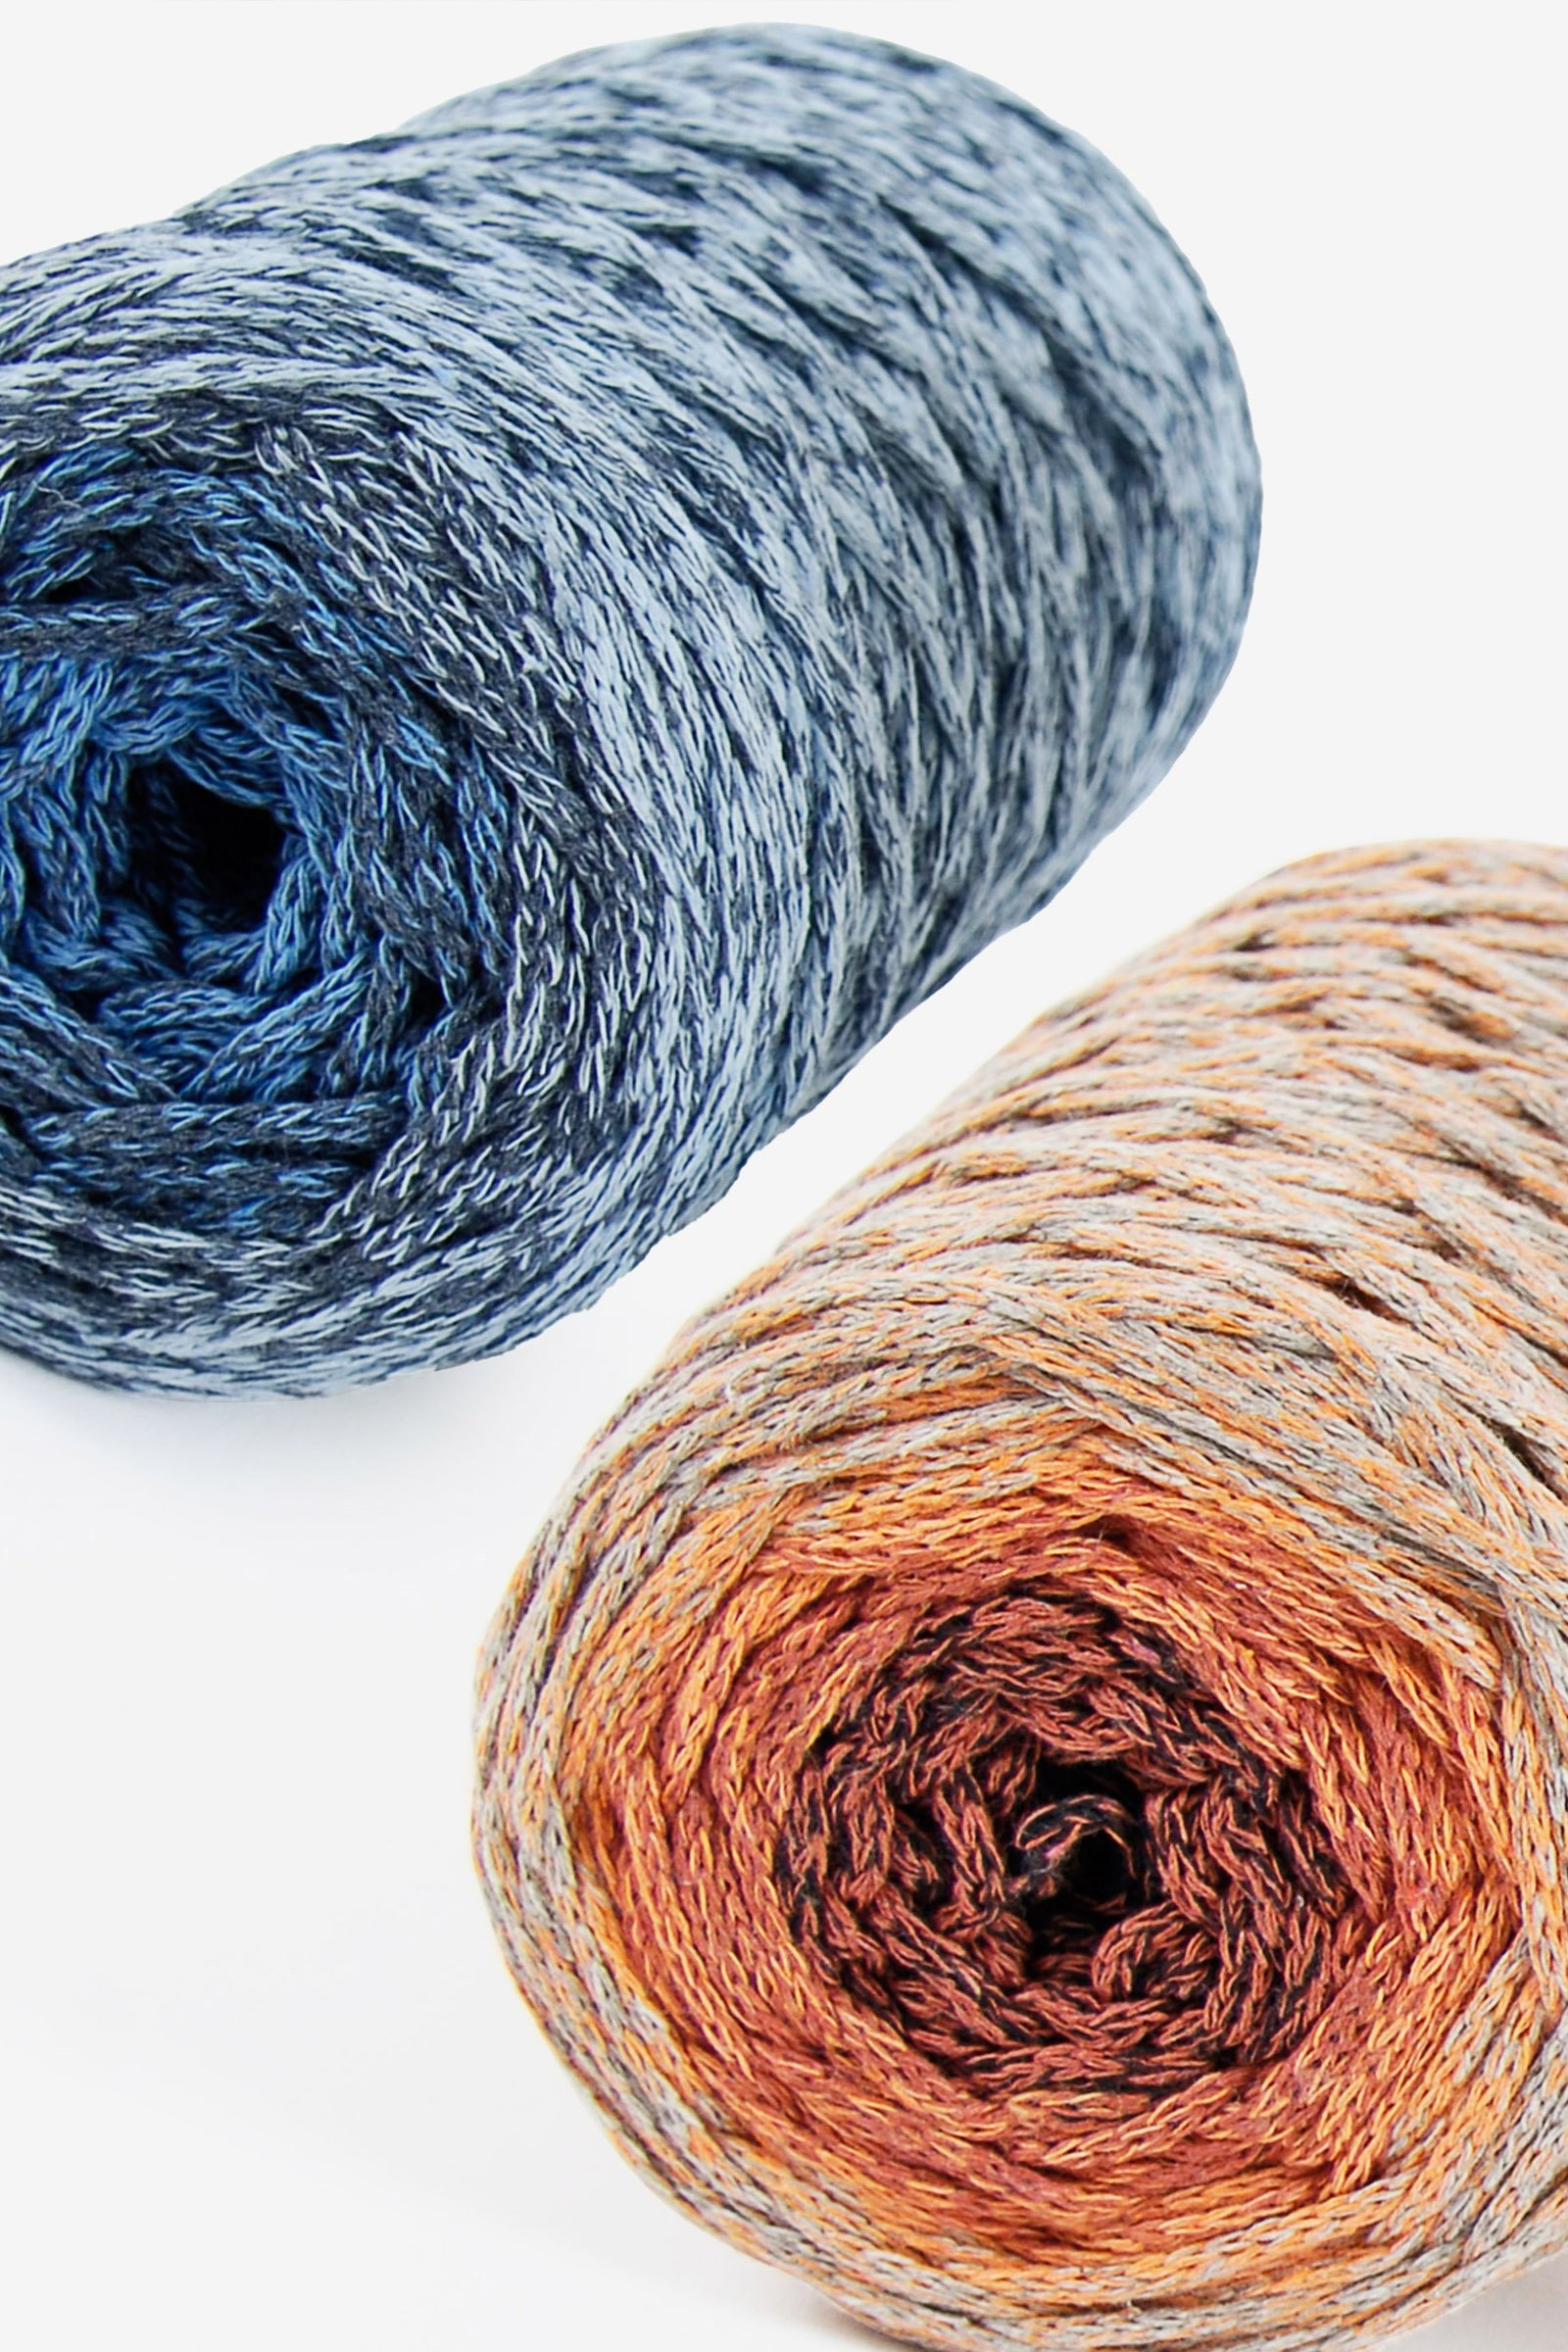 Fil NOVA VITA 4 - Couleurs Multico - Crochet Tricot Macramé